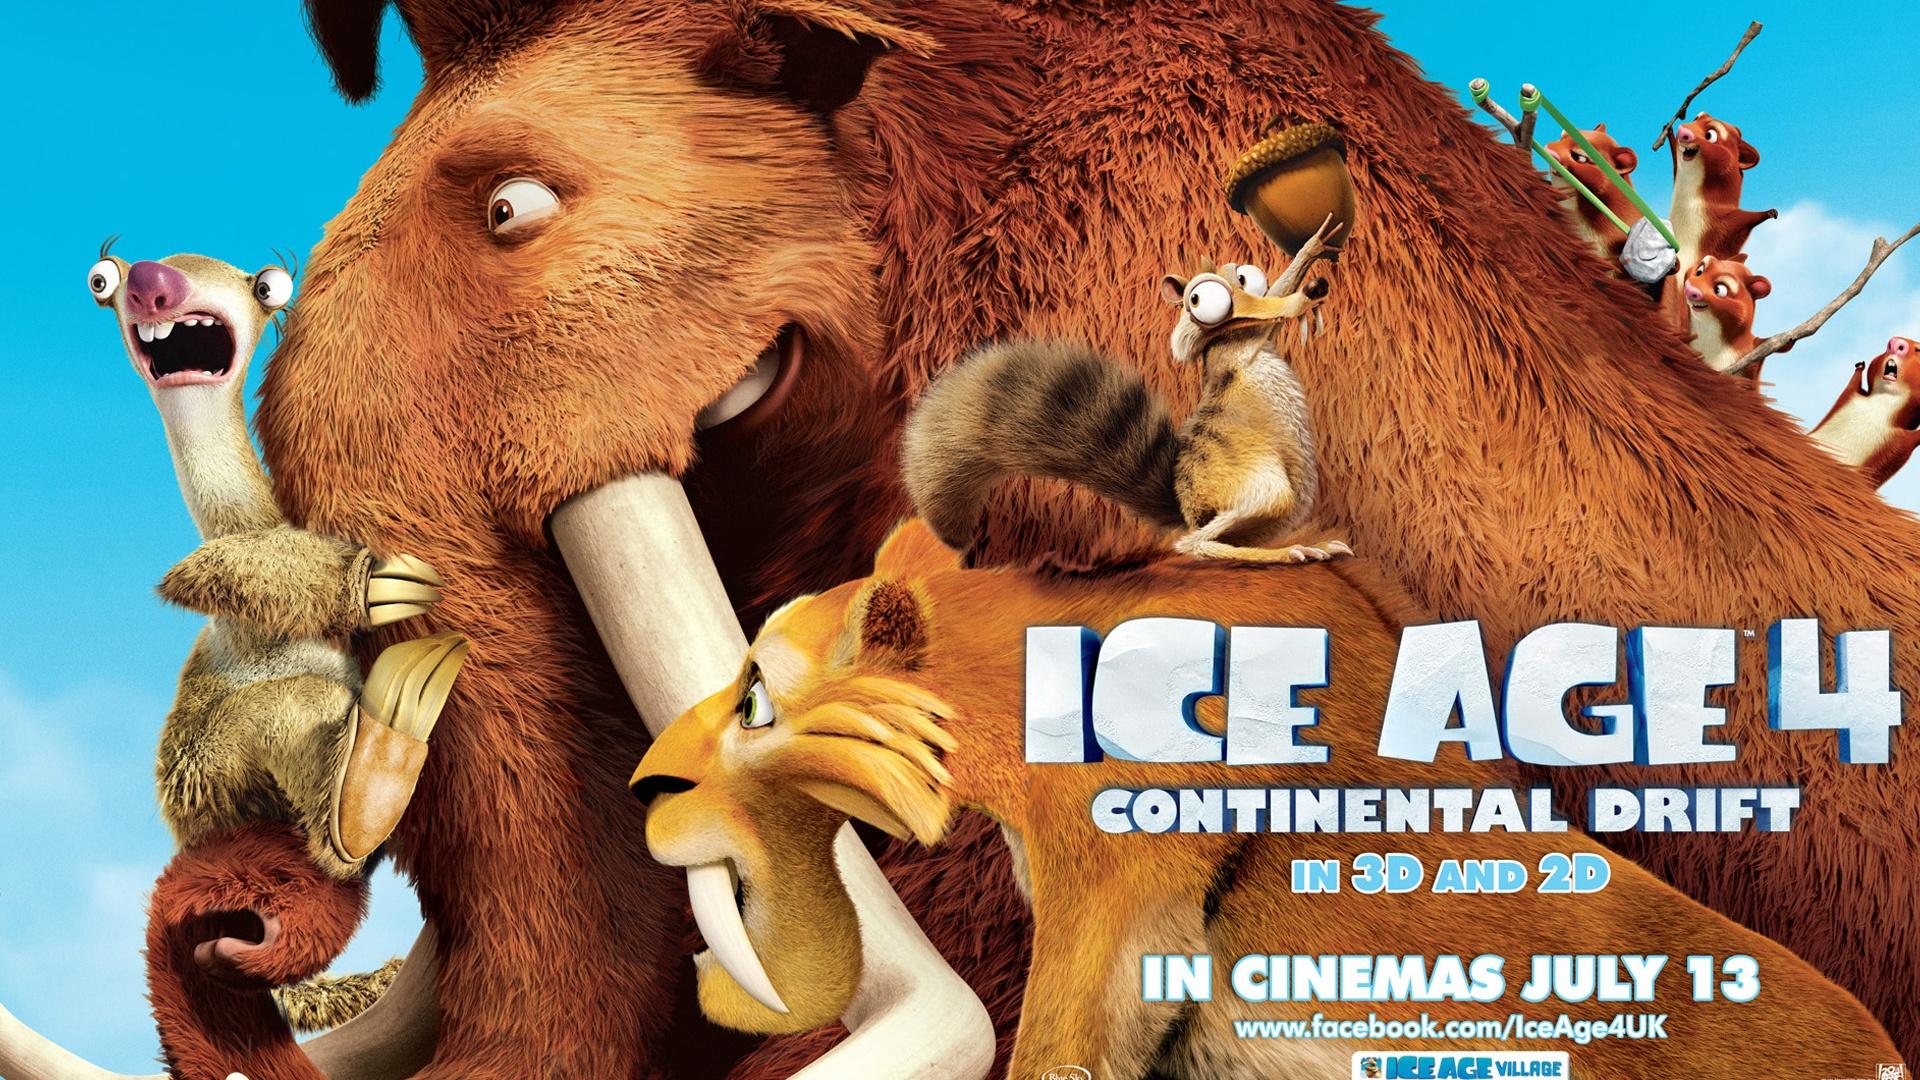 Wallpaper Ice Age 4: Continental Drift wide 1920x1200 HD ...